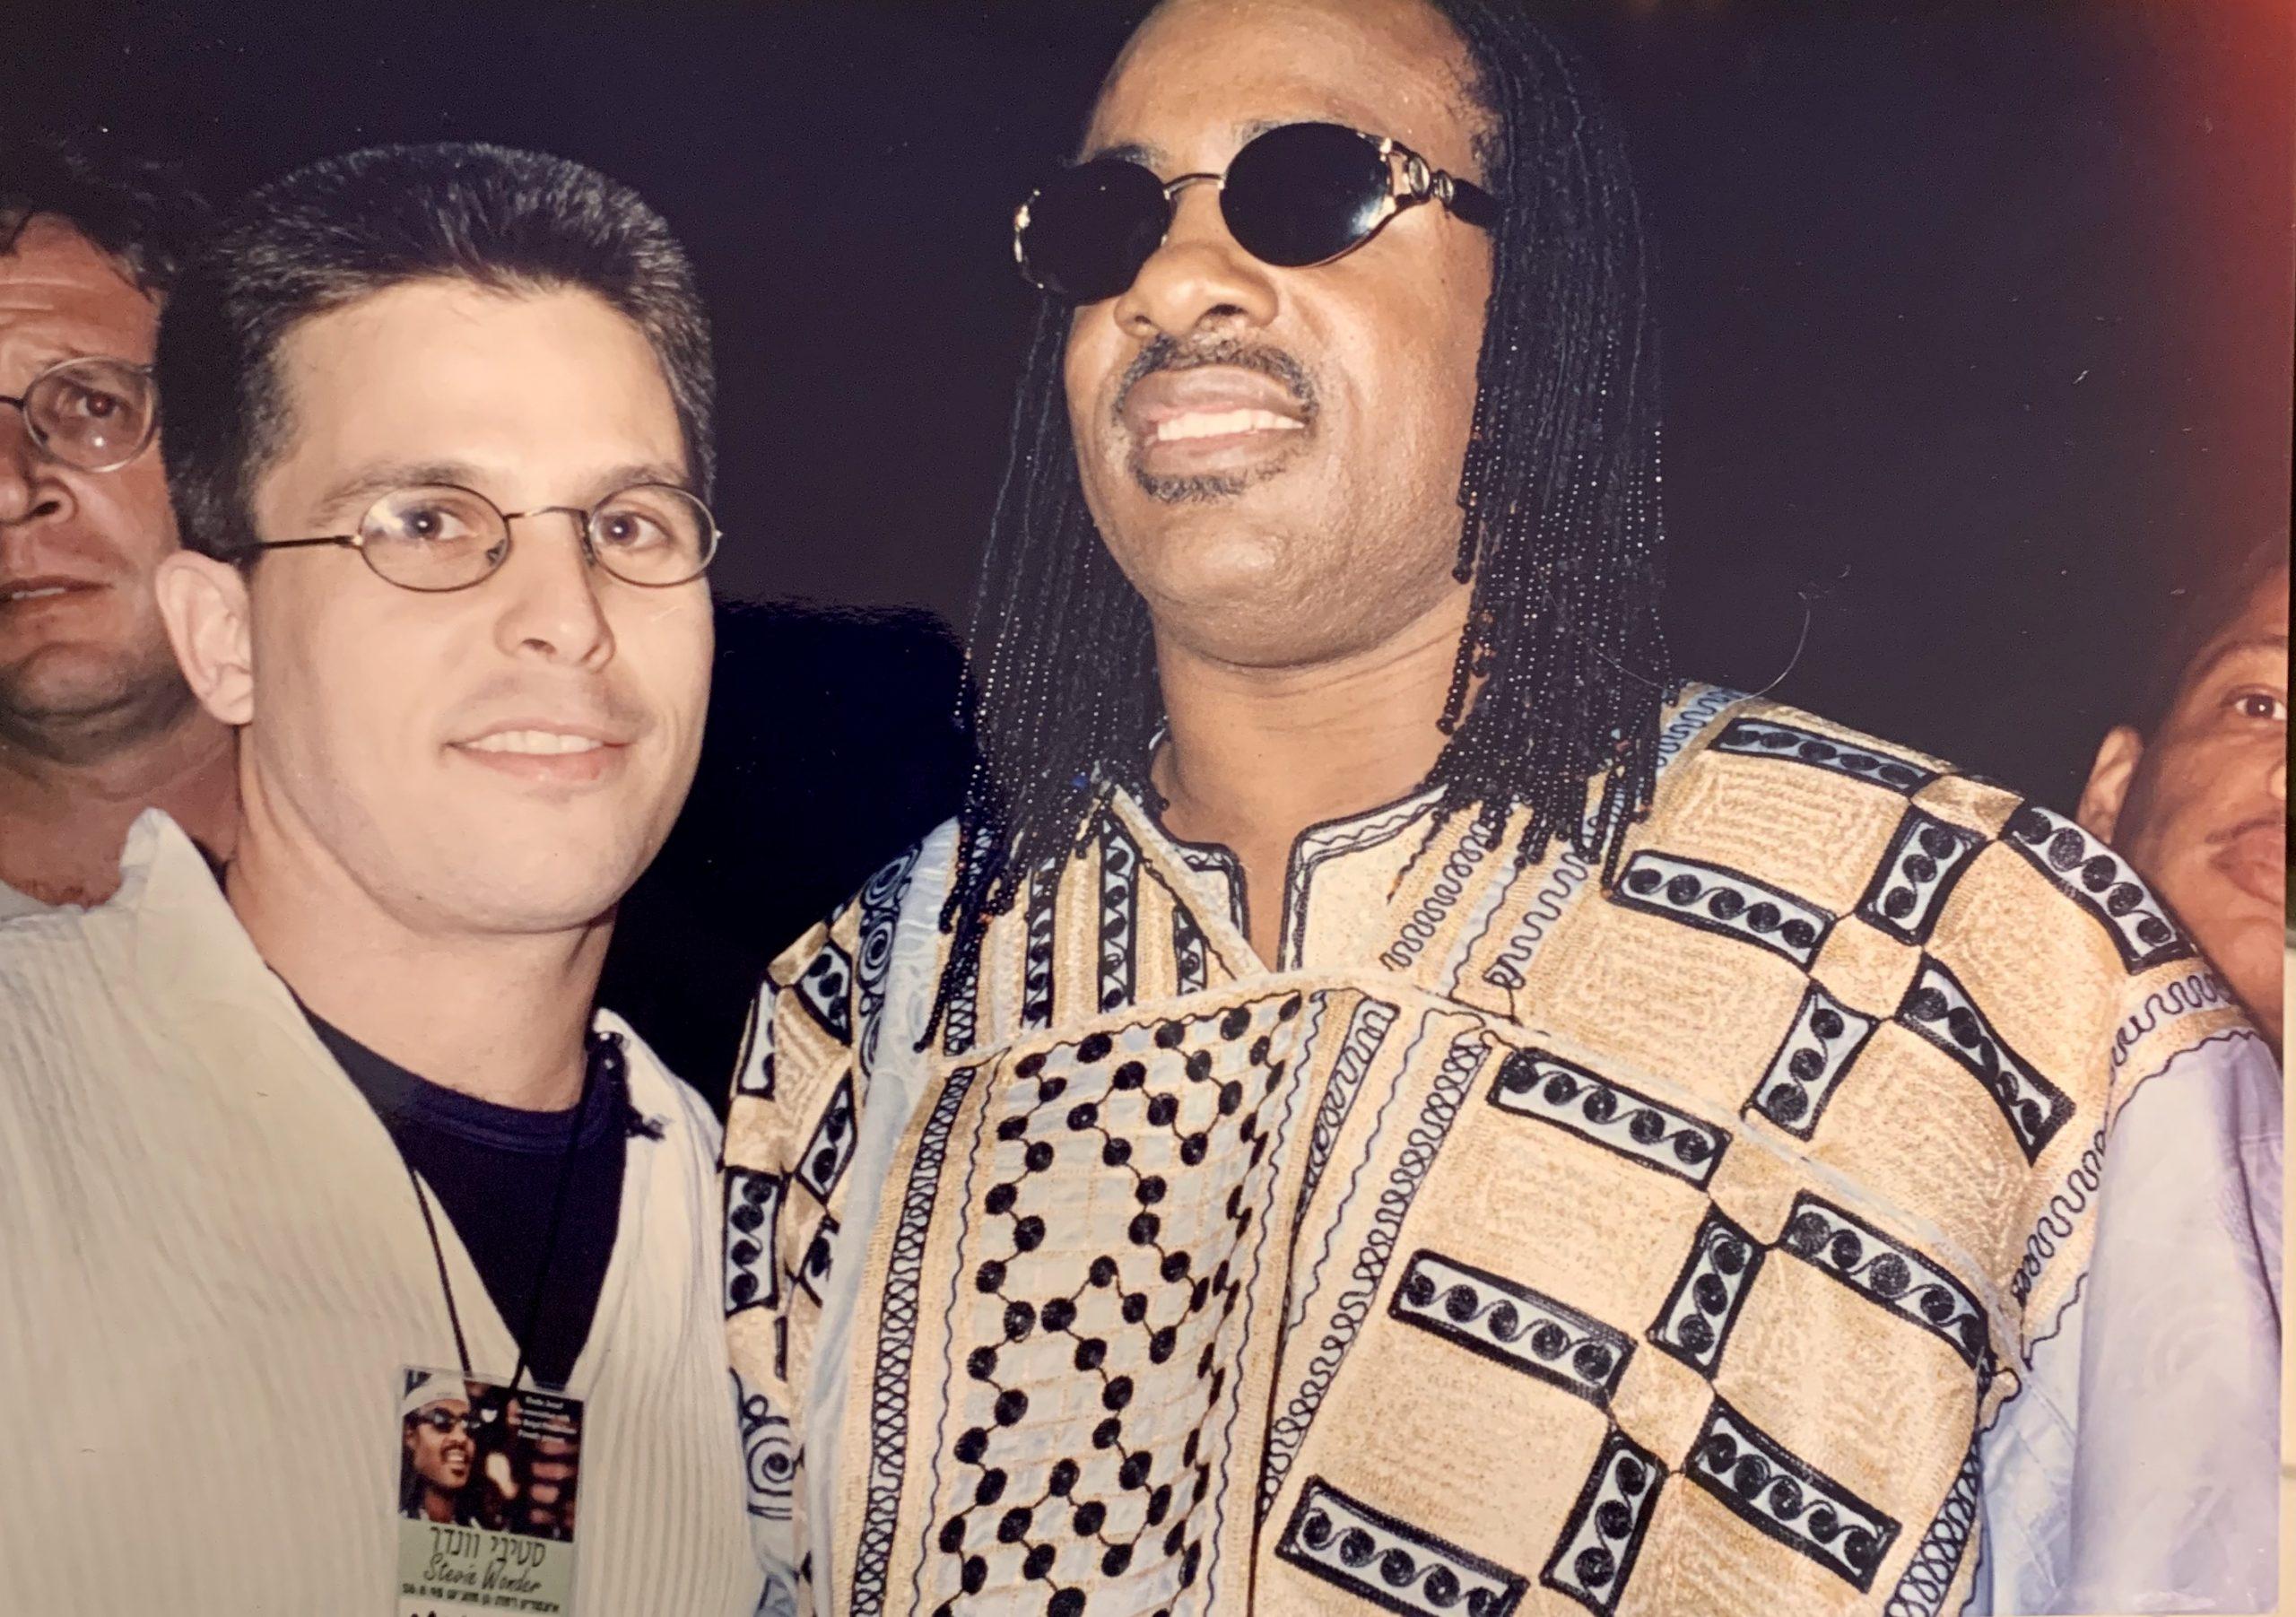 Stevie Wonder & saxophonist Arik Livnat